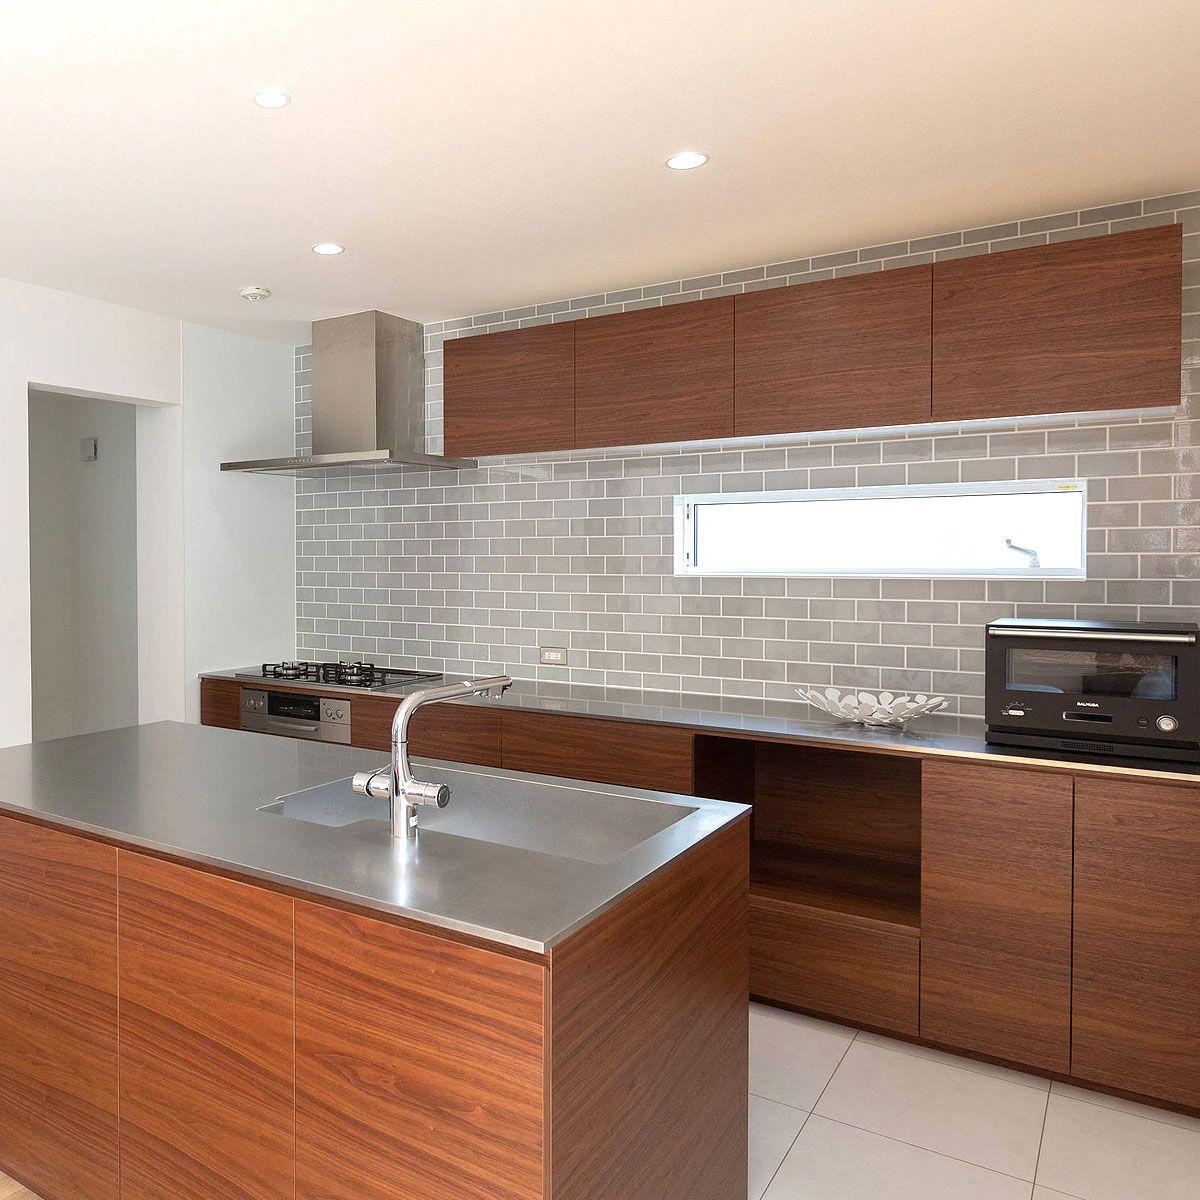 84 stainless steel countertop ideas photos pros cons